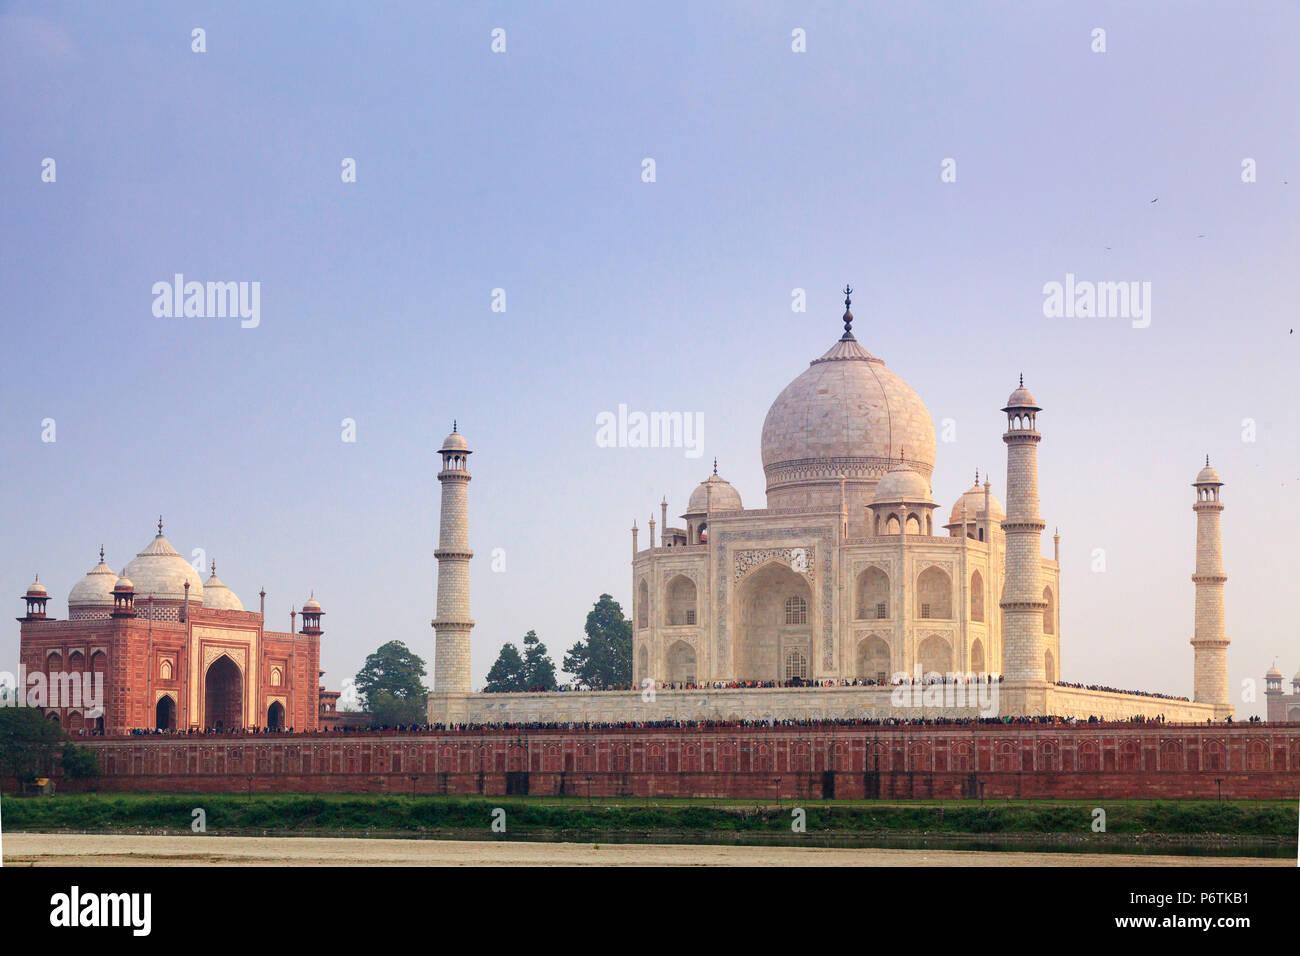 India, Uttar Pradesh, Agra, Taj Mahal (UNESCO site) - Stock Image